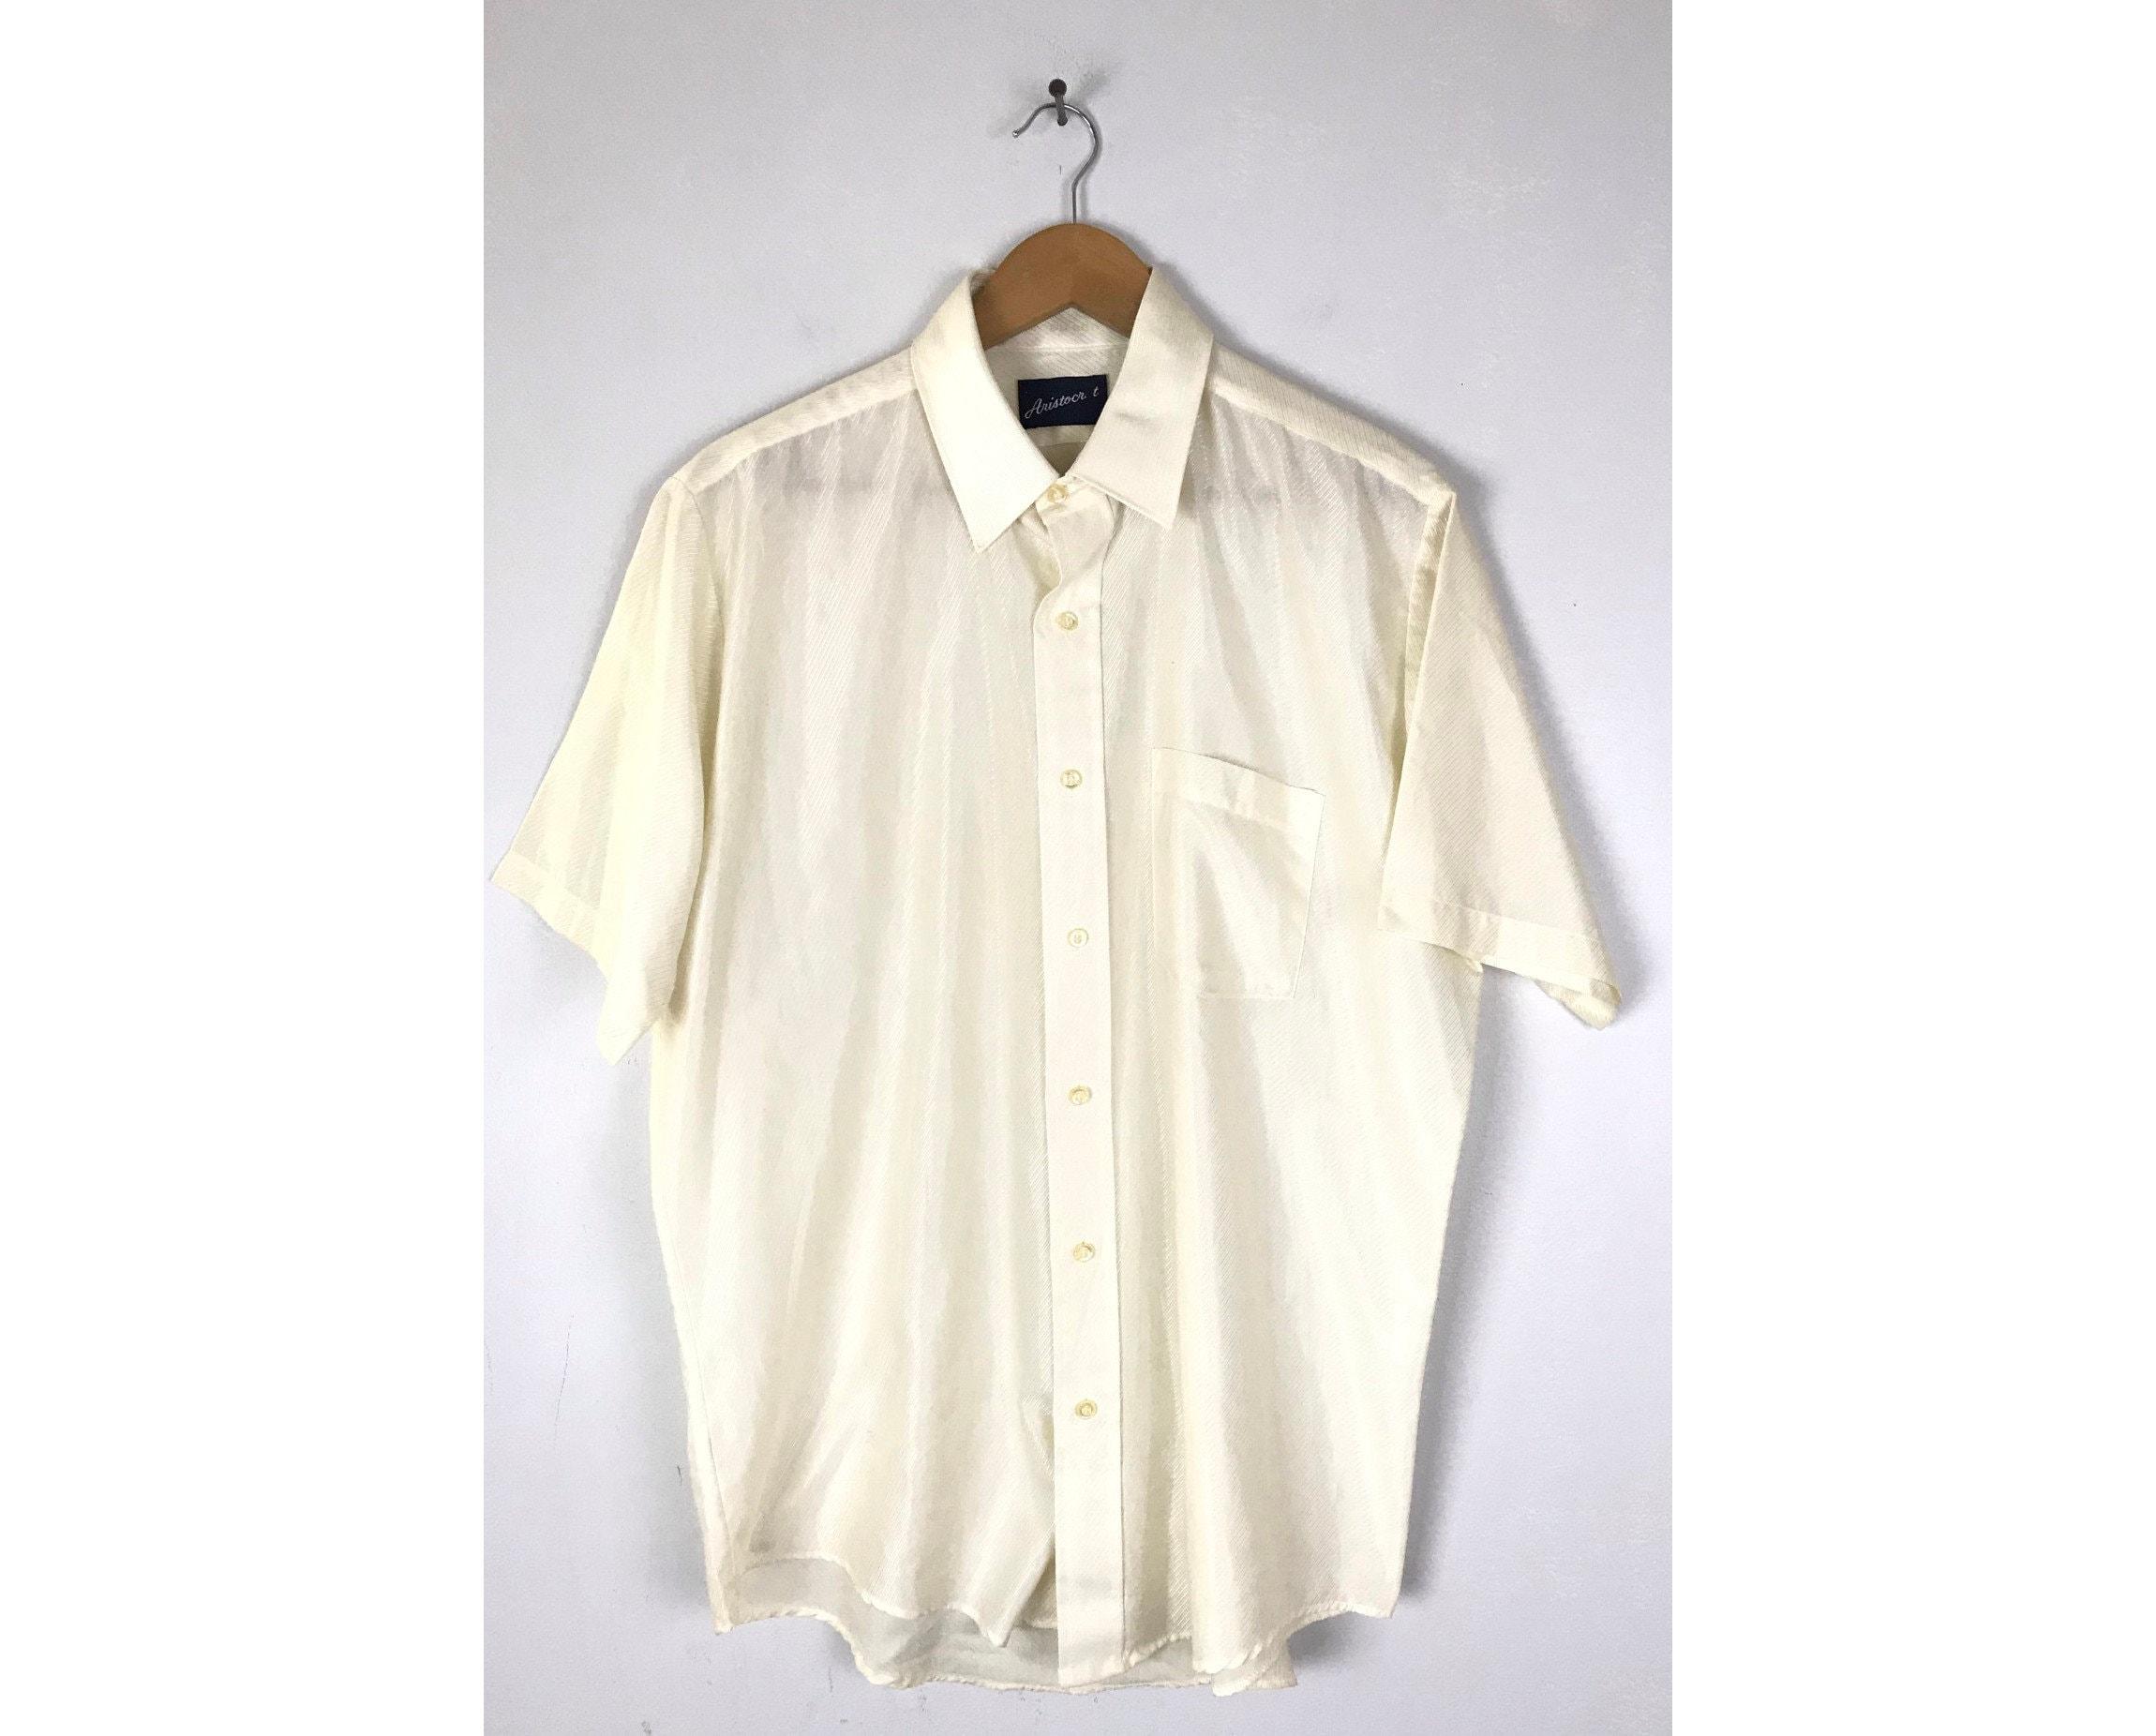 1970s Mens Shirt Styles – Vintage 70s Shirts for Guys 70S Cream Shiny Striped Disco Shirt Mens Size 16 Xl, Vintage Off White Button Down Shirt, 1970S Retro $26.00 AT vintagedancer.com